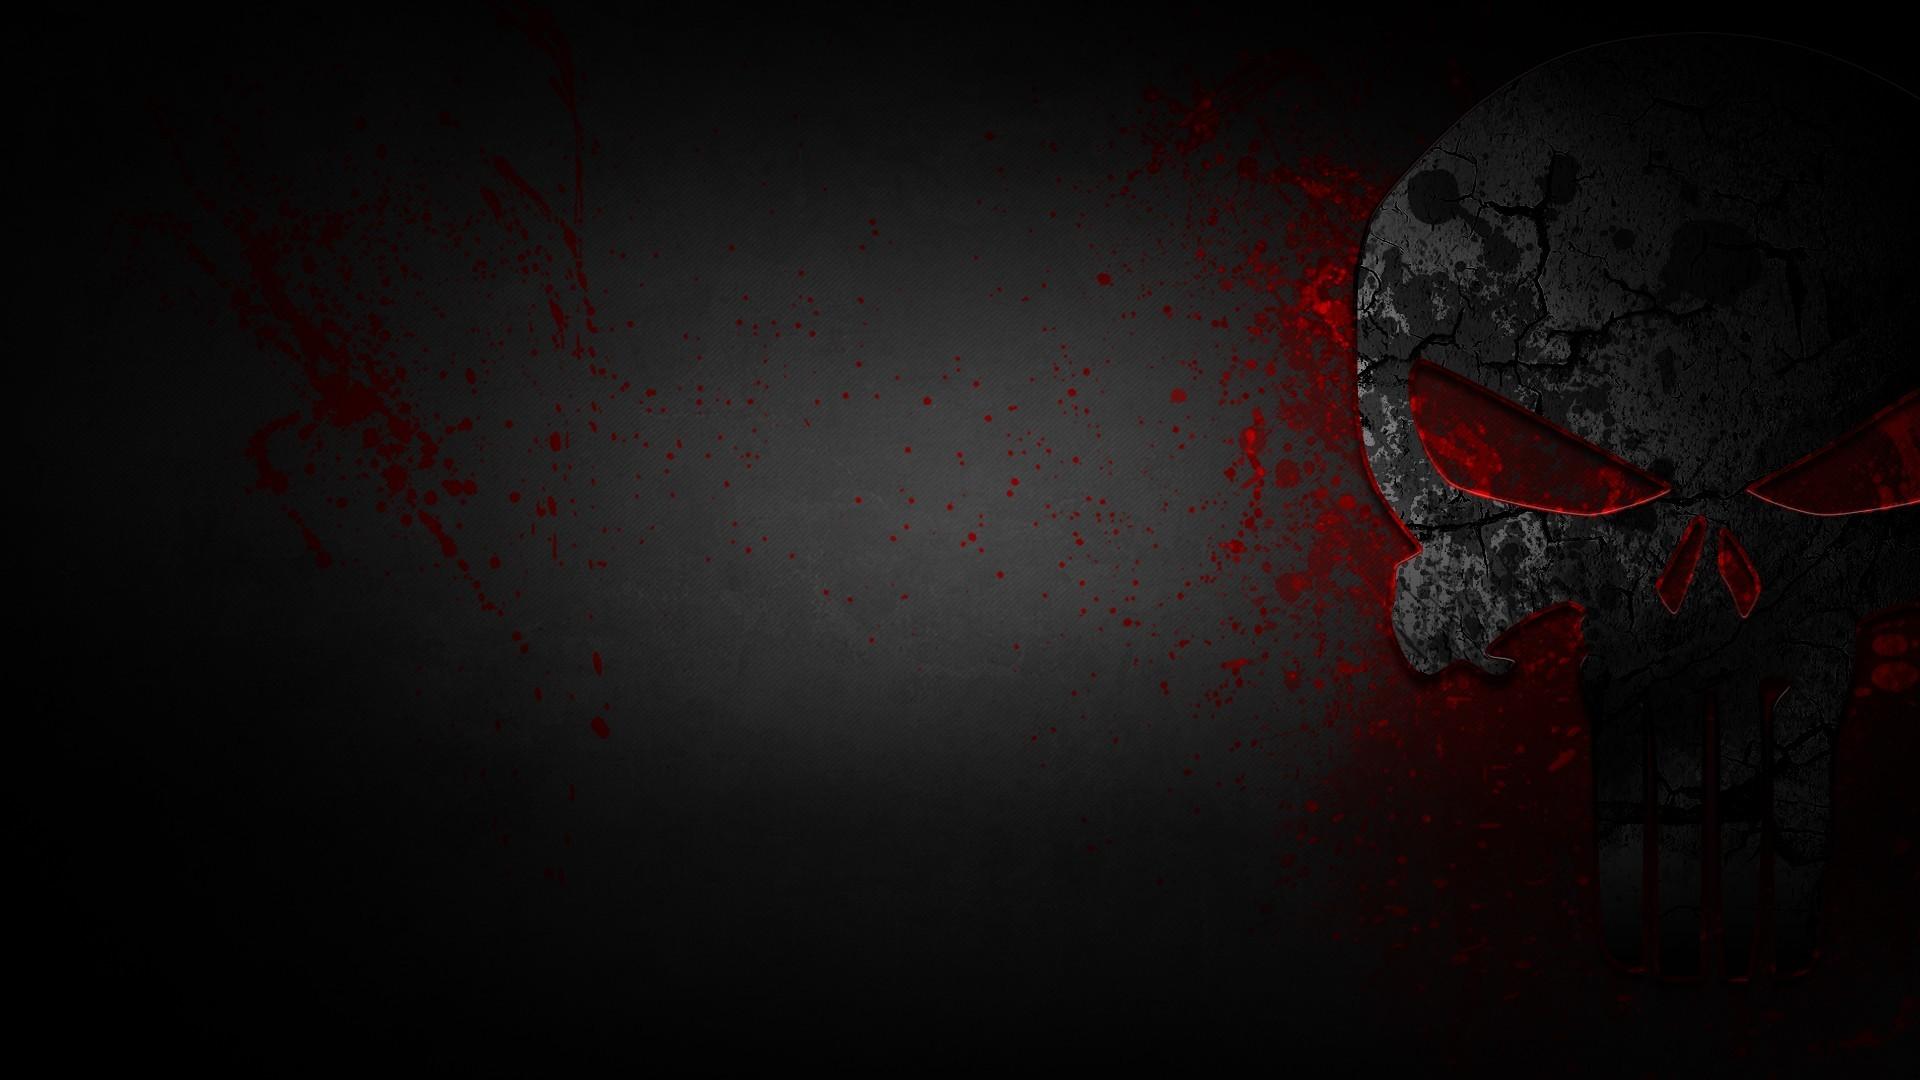 Punisher Skull Wallpaper Related Keywords & Suggestions – Punisher .